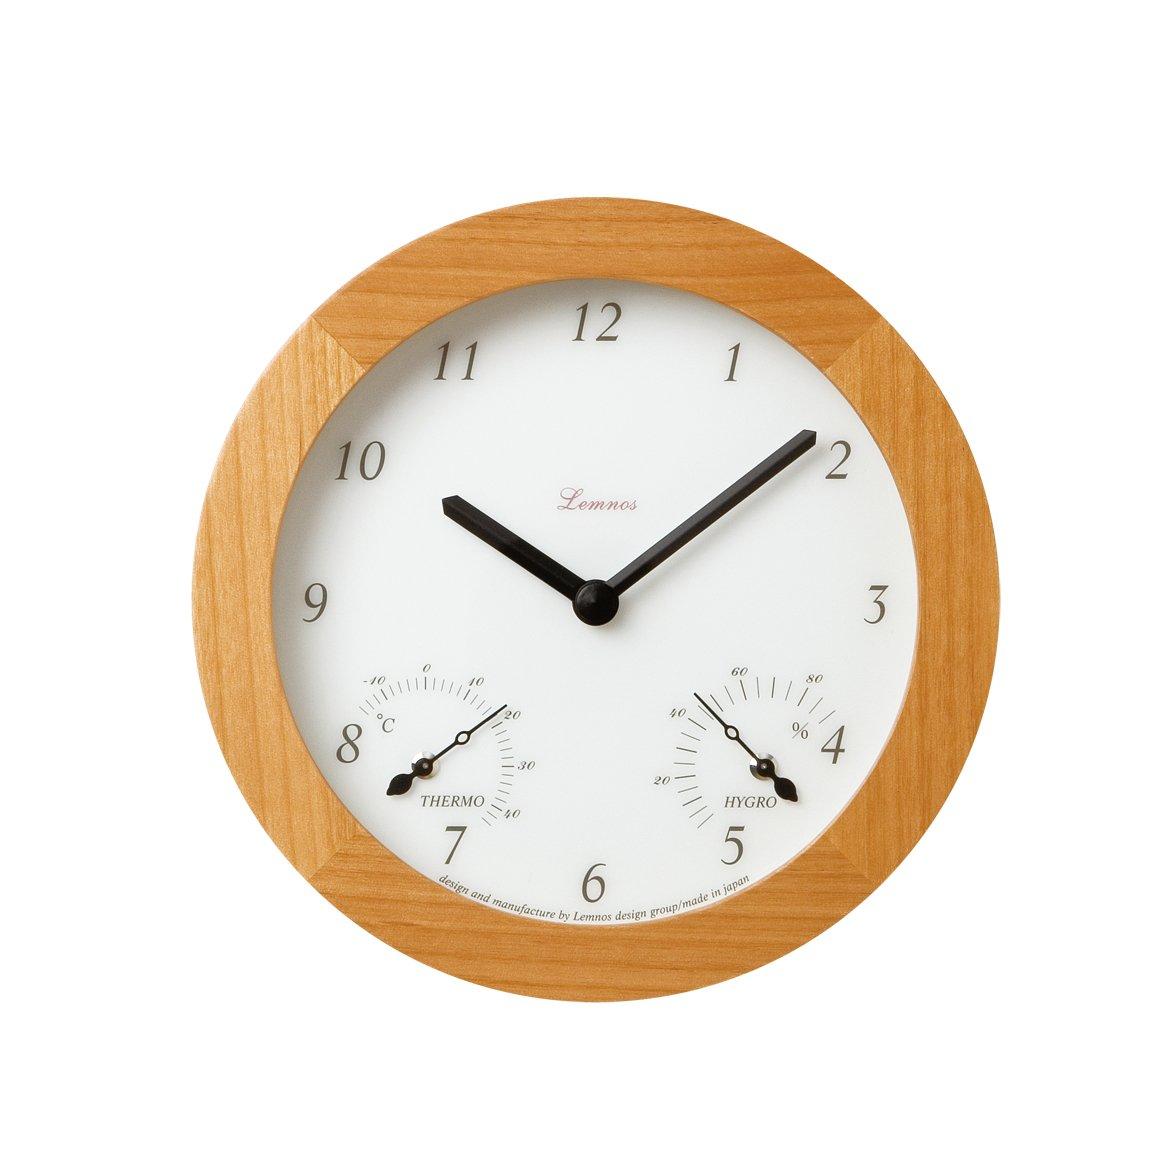 Lemnos Mignon 温室度計付時計 ナチュラル PC07-08 NT B000RLWBUOナチュラル